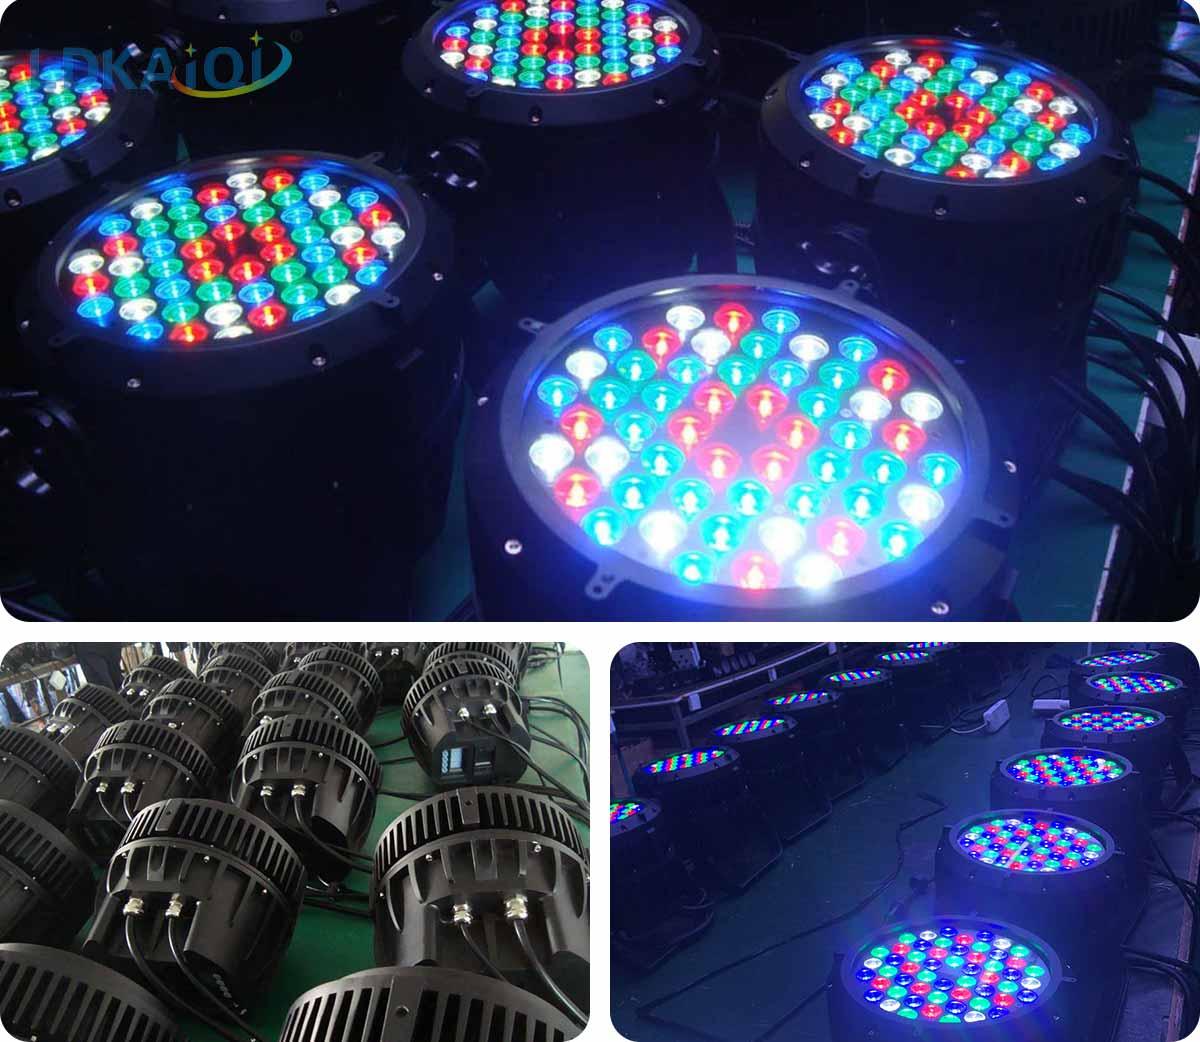 RGBW led waterproof par light 54x3W(图2)